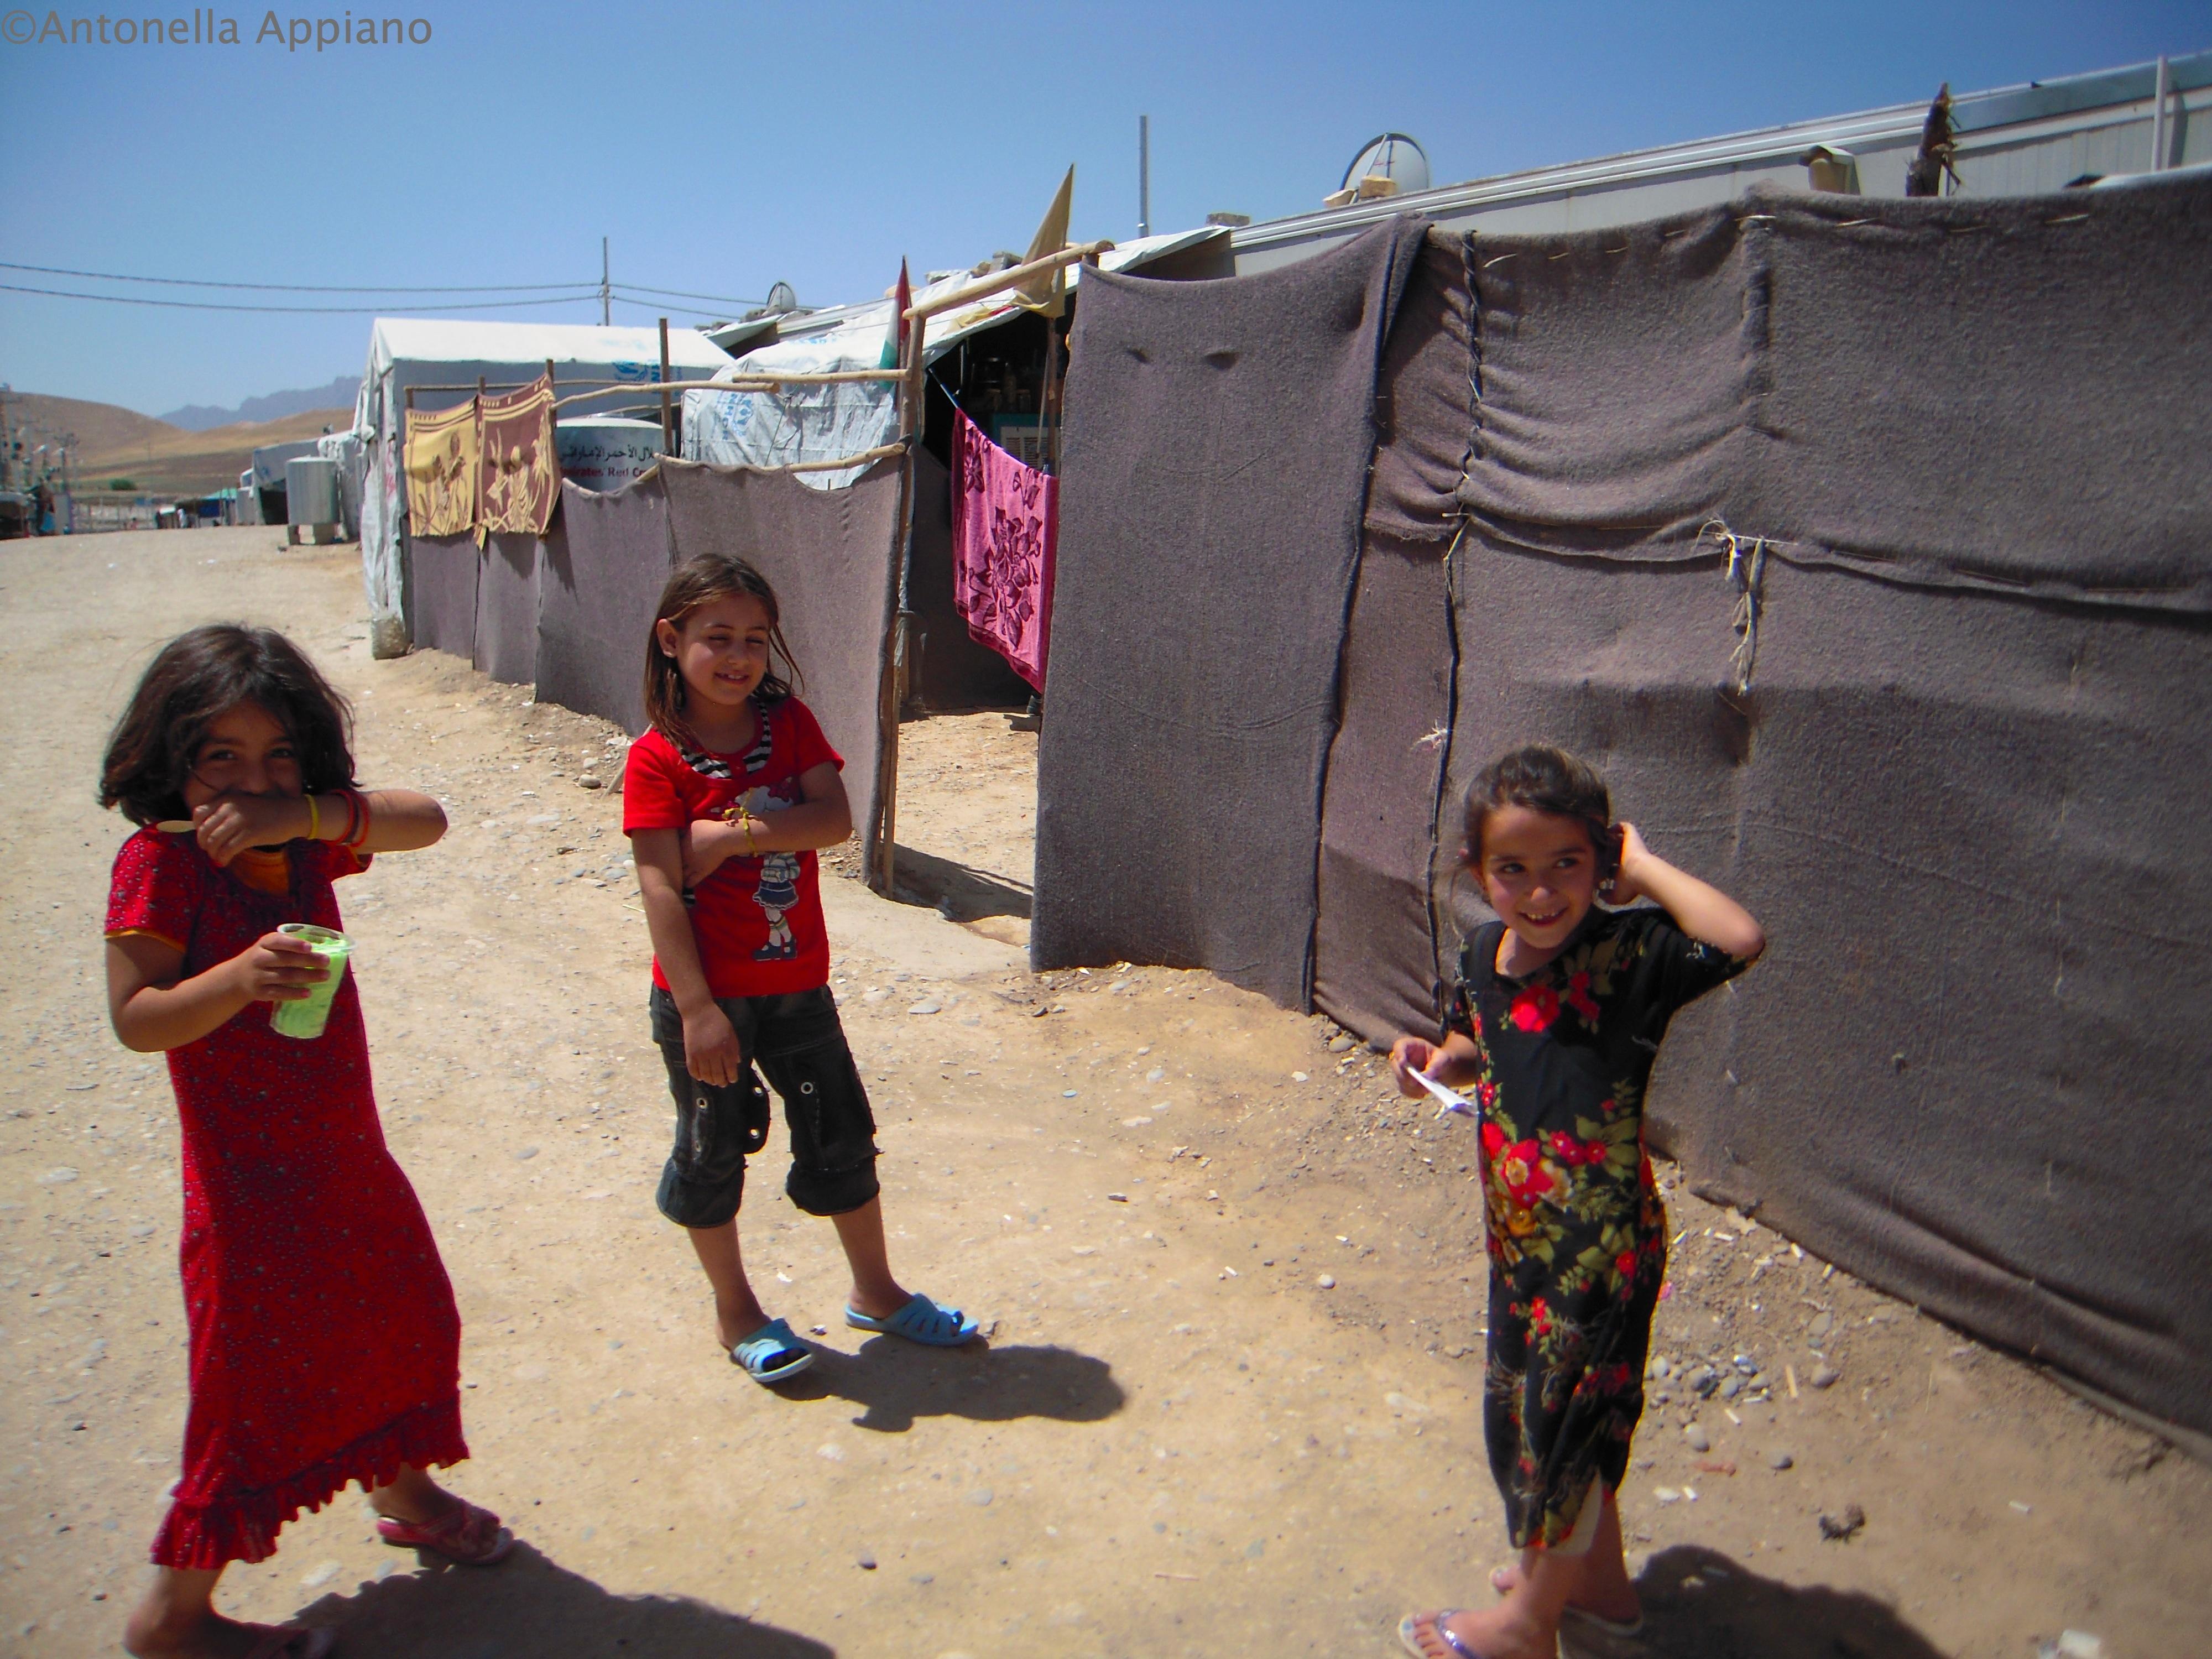 Bambini - Campo Profughi siriano di Basirma - Shaqlawa - Kurdistan iracheno